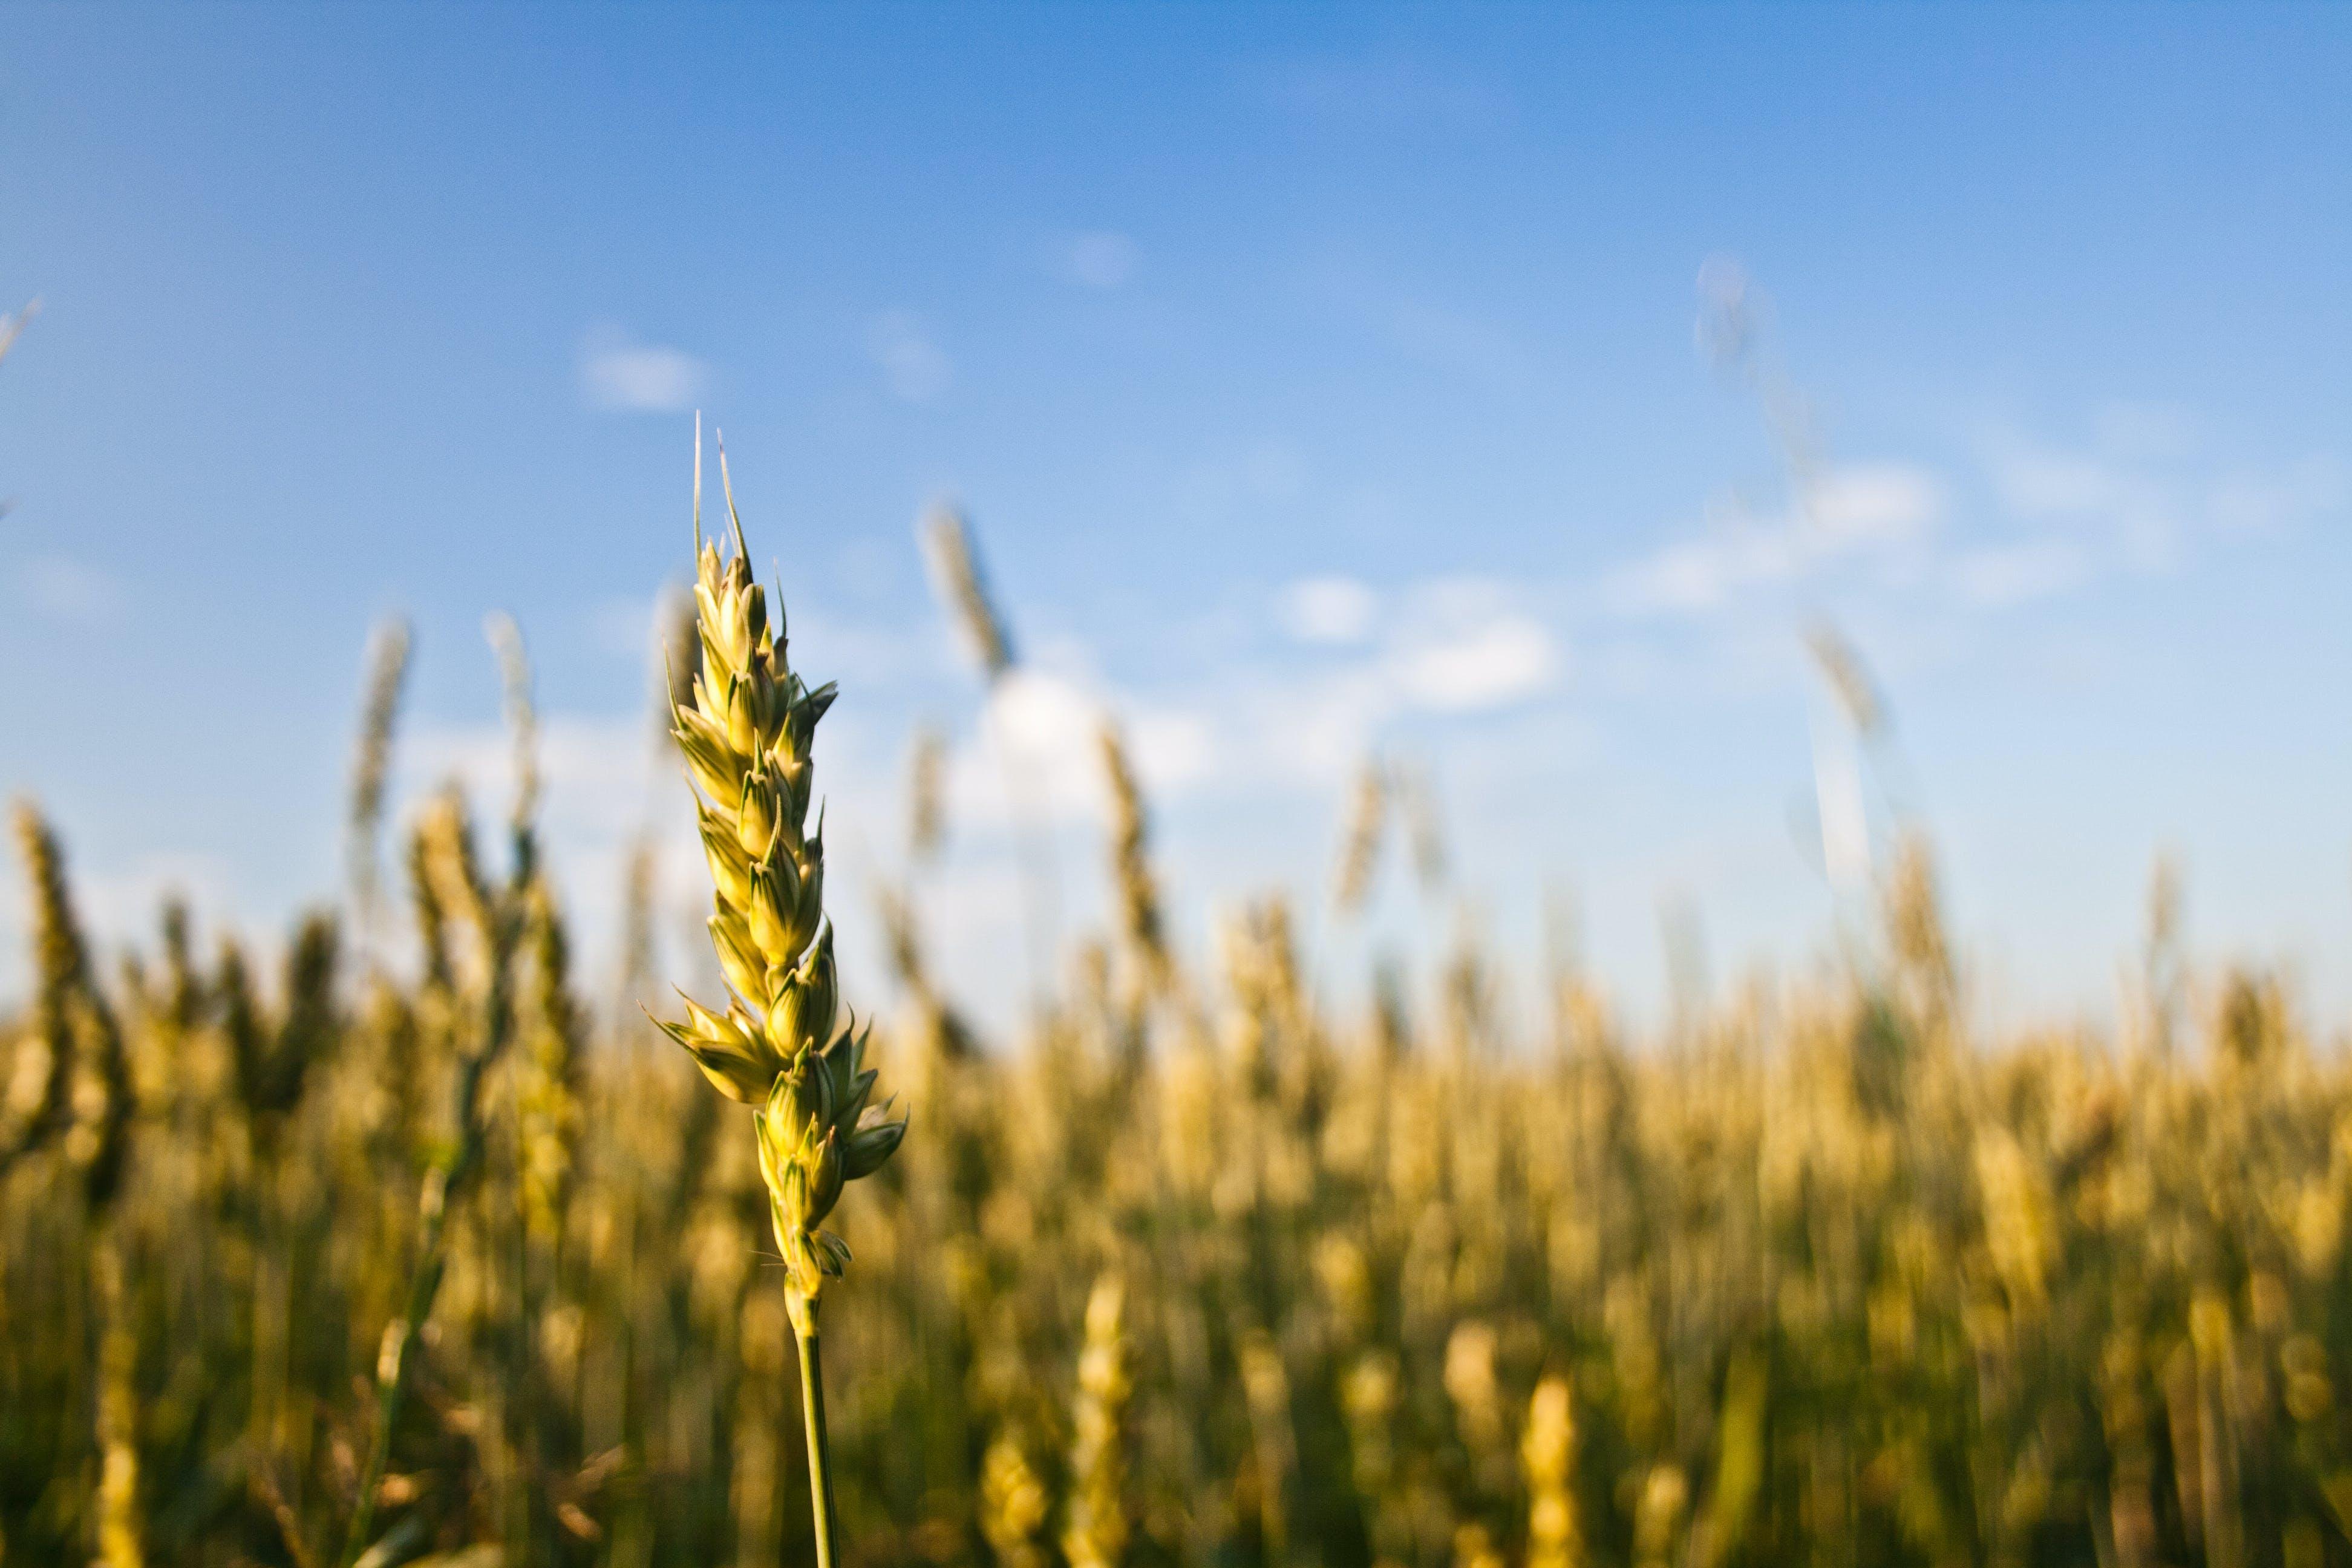 Kostenloses Stock Foto zu natur, feld, korn